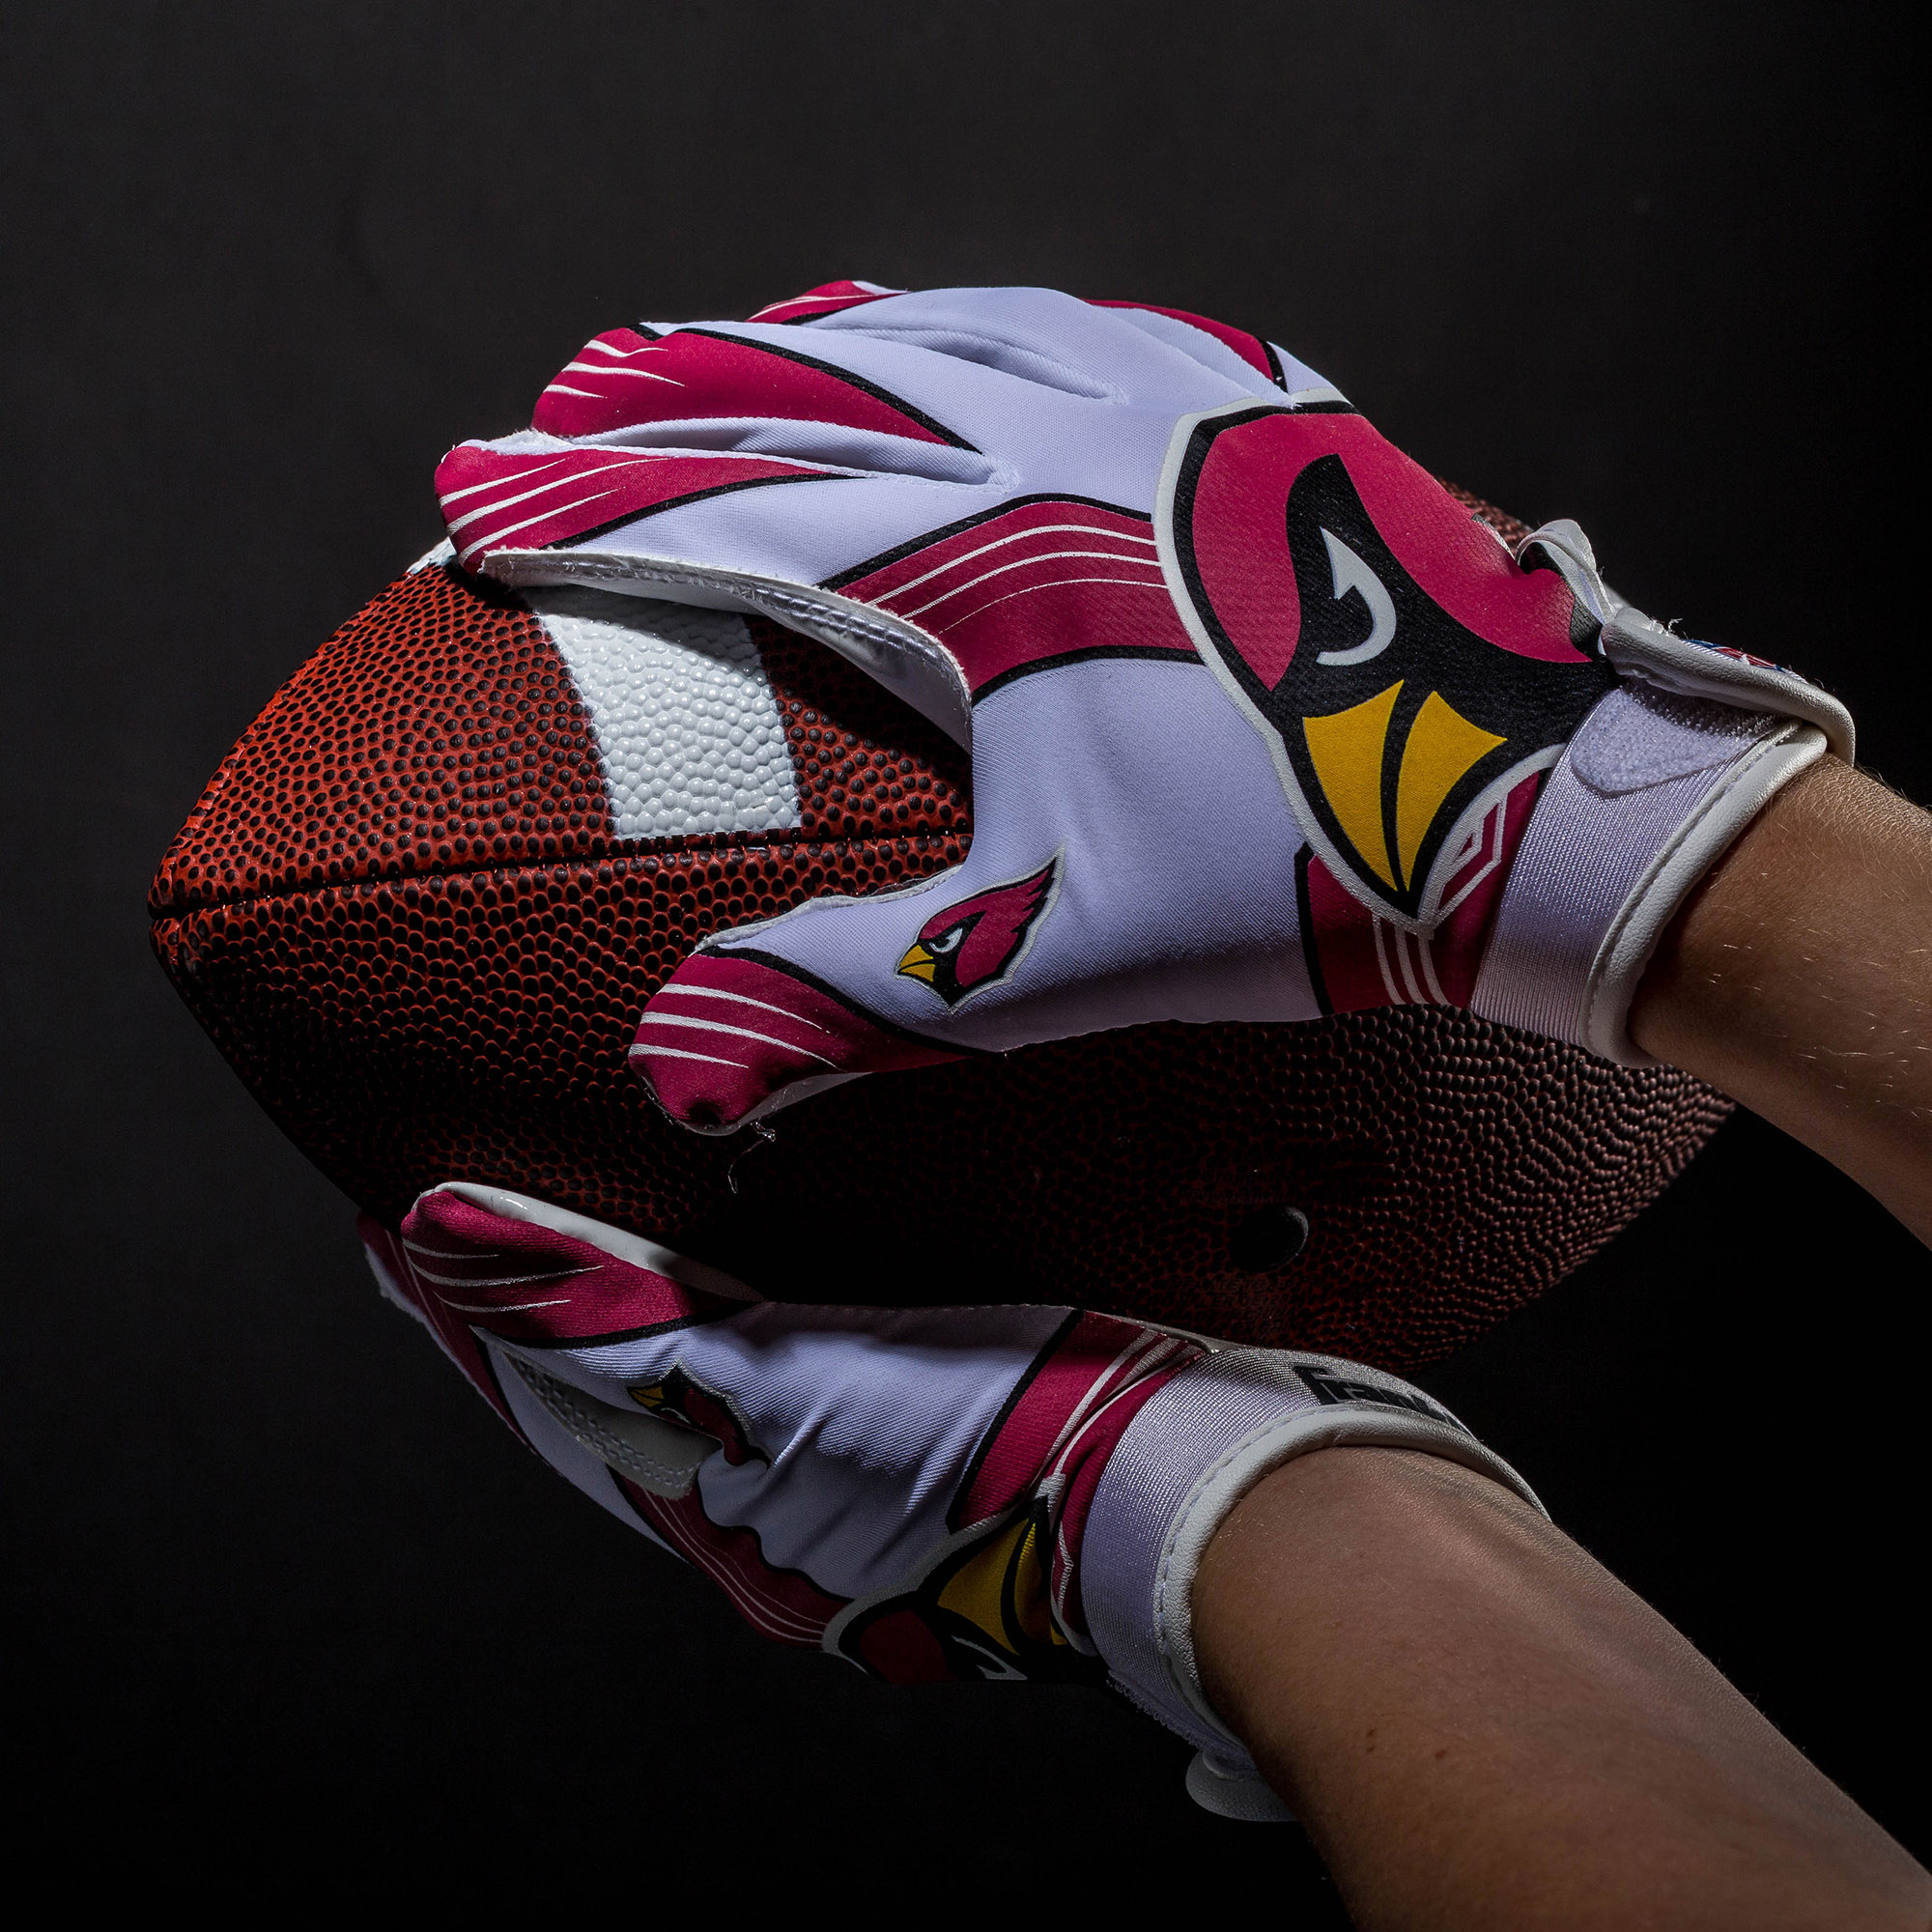 Nfl Arizona Cardinals Youth Football Receiver Gloves Walmart Com Walmart Com